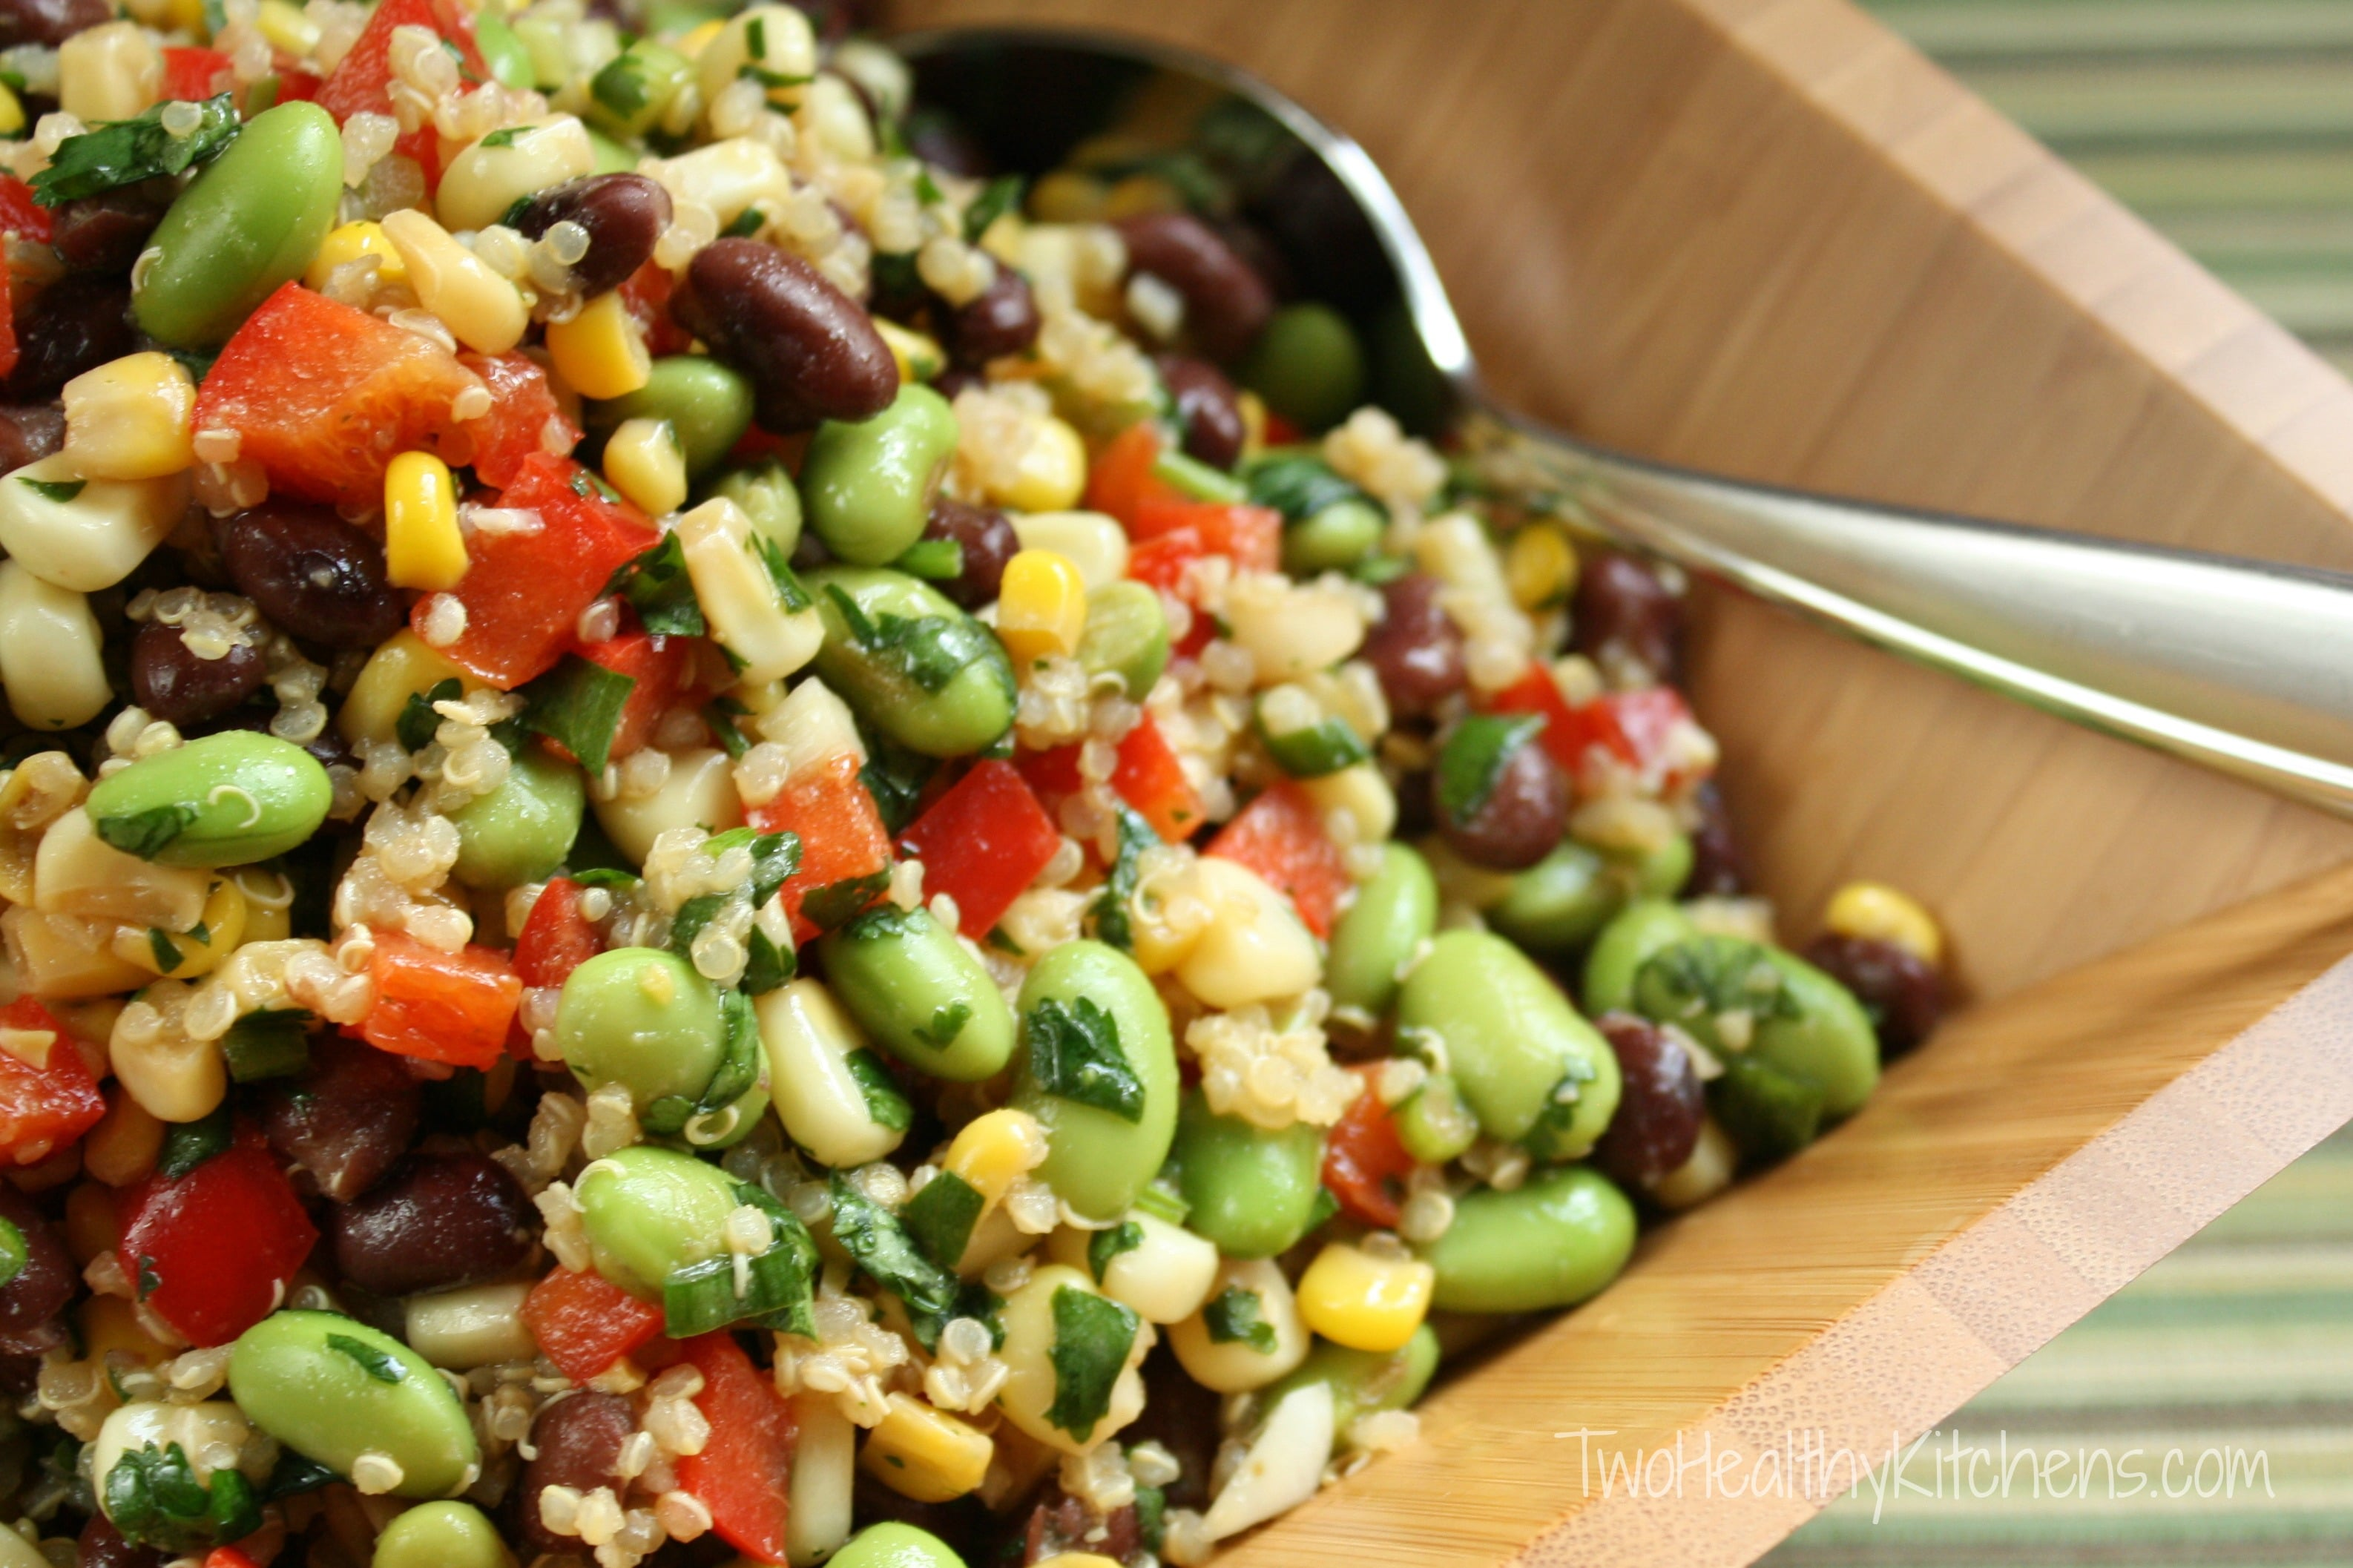 Corn, Edamame and Quinoa Salad with Lemon-Dijon Vinaigrette Recipe {www.TwoHealthyKitchens.com}